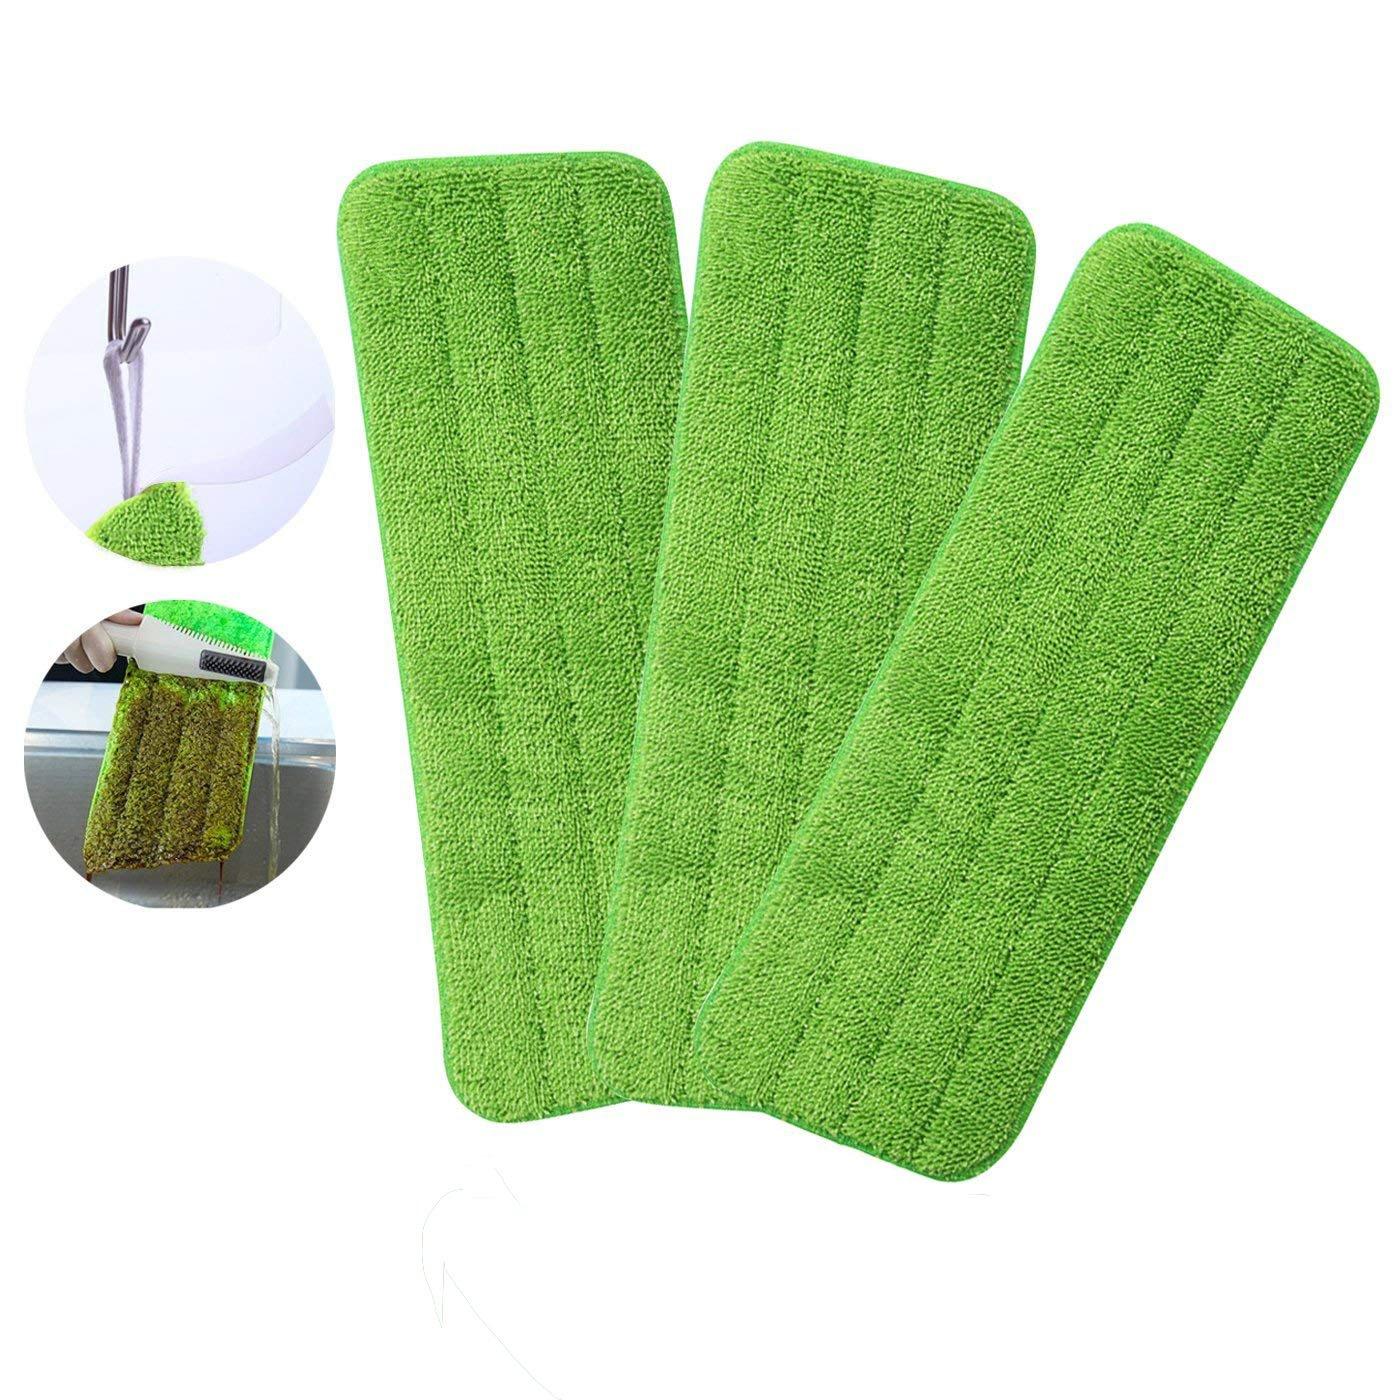 600ML Multifunction Spray Mop Microfiber Cloth Hand Wash Plate Mop Home Floor Windows Kitchen Cleaning Mop Tool Sweeper Broom,2